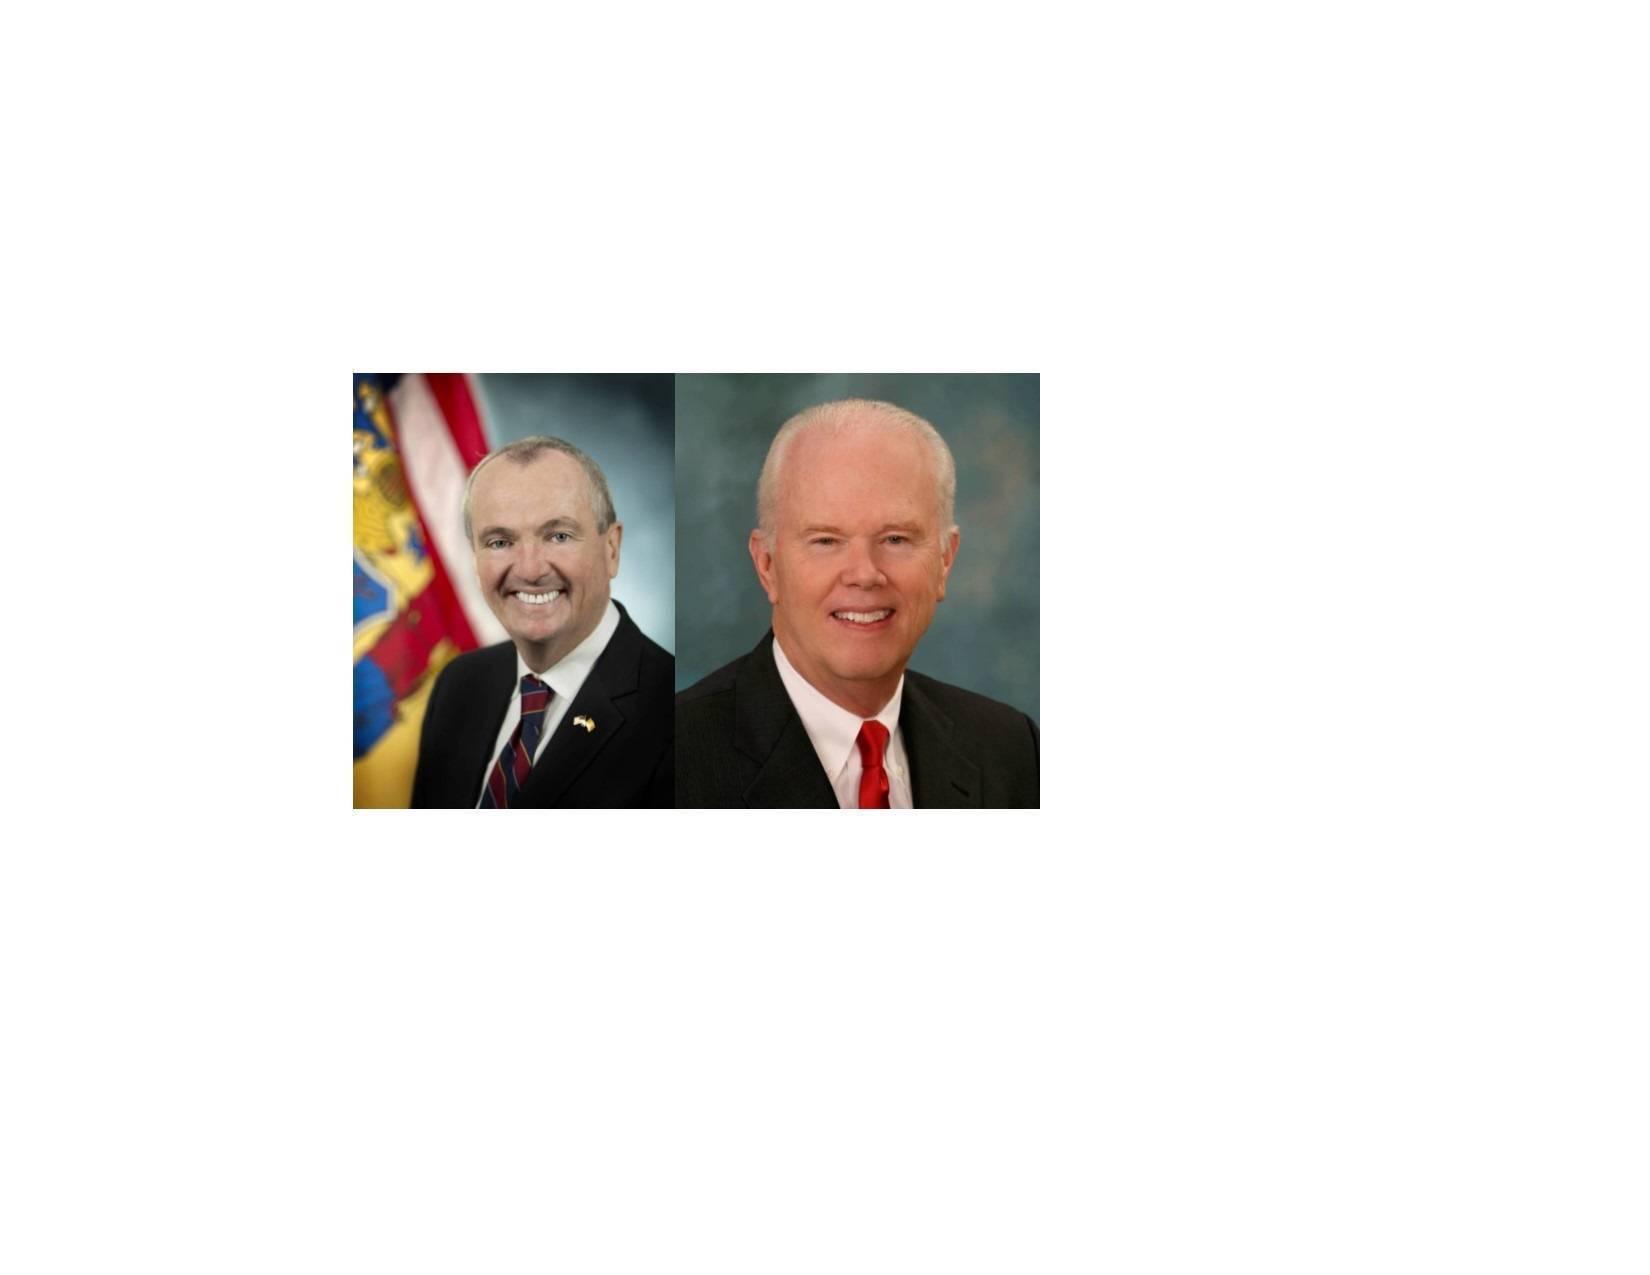 ac7c62e34fc54aae5d3a_11c82850aae3cd80bca8_Governor_Murphy_and_Senator_Diegnan.jpg